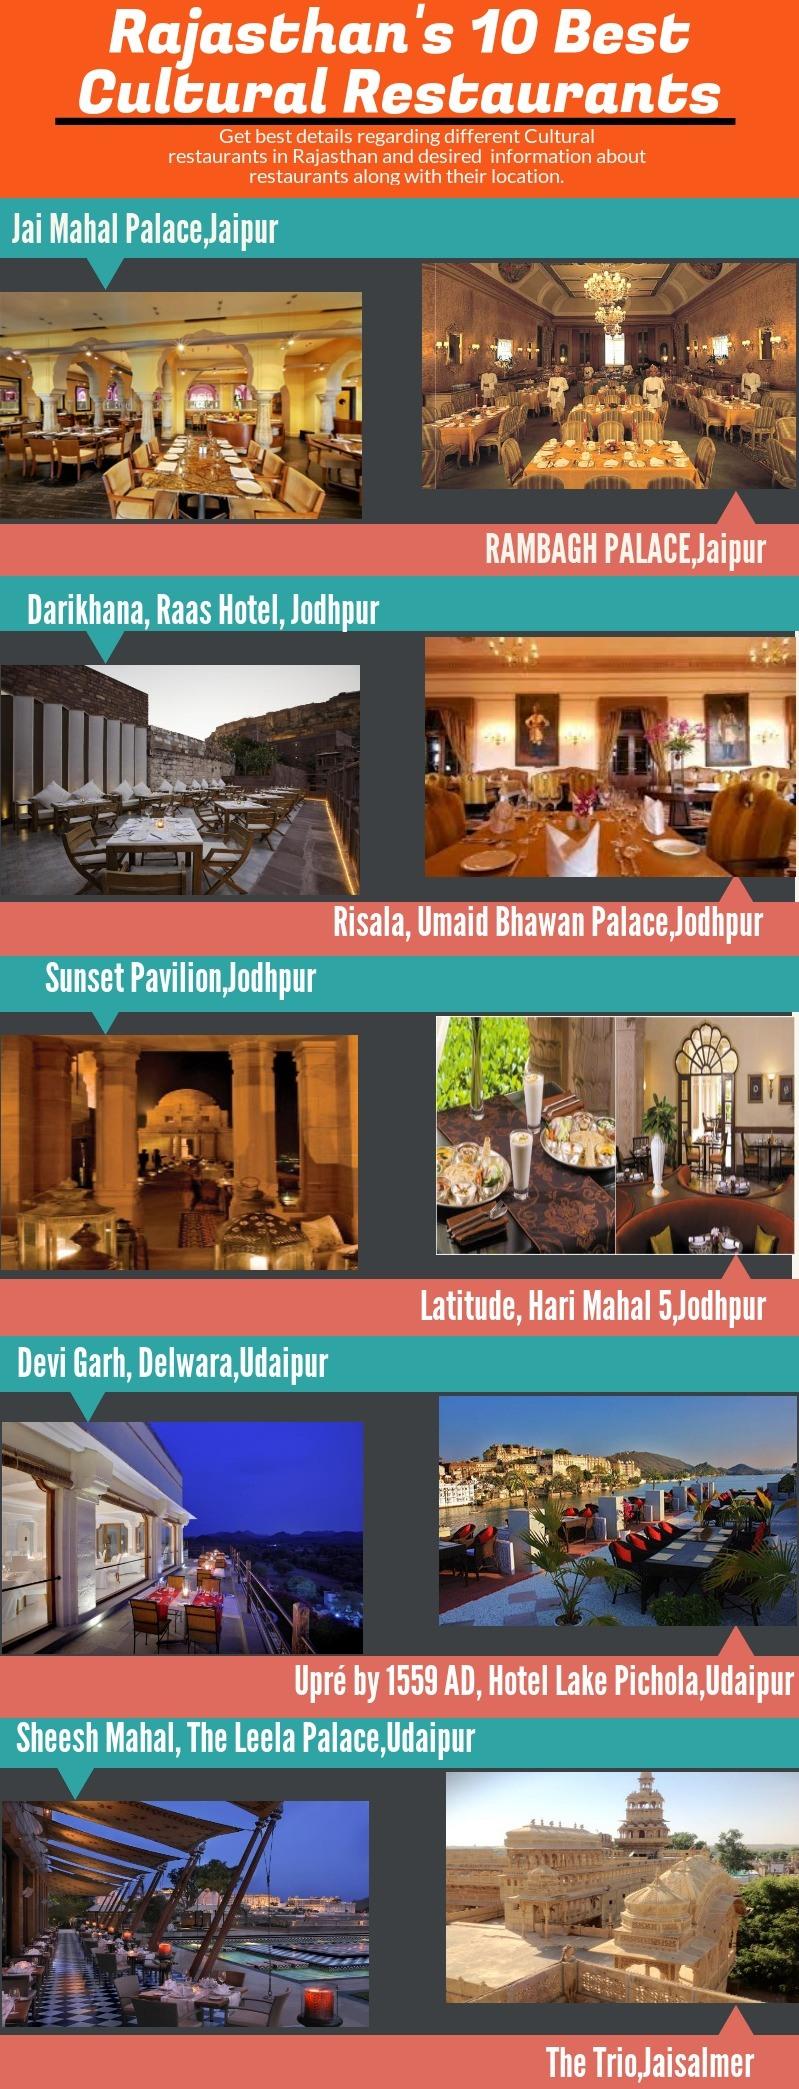 RajasthanRestaurants